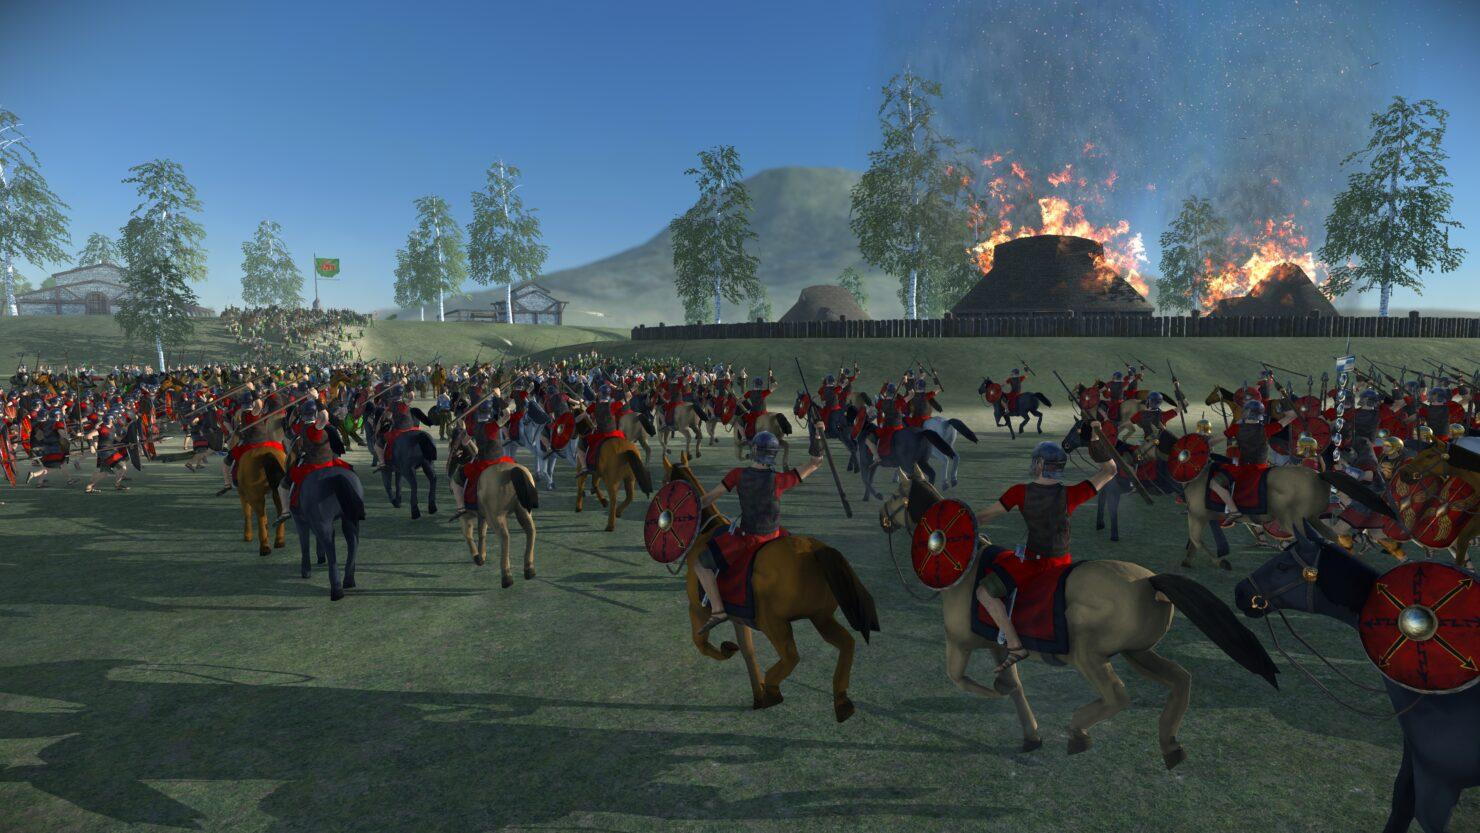 total-war-rome-remastered-announcement-04-julii-v-gauls